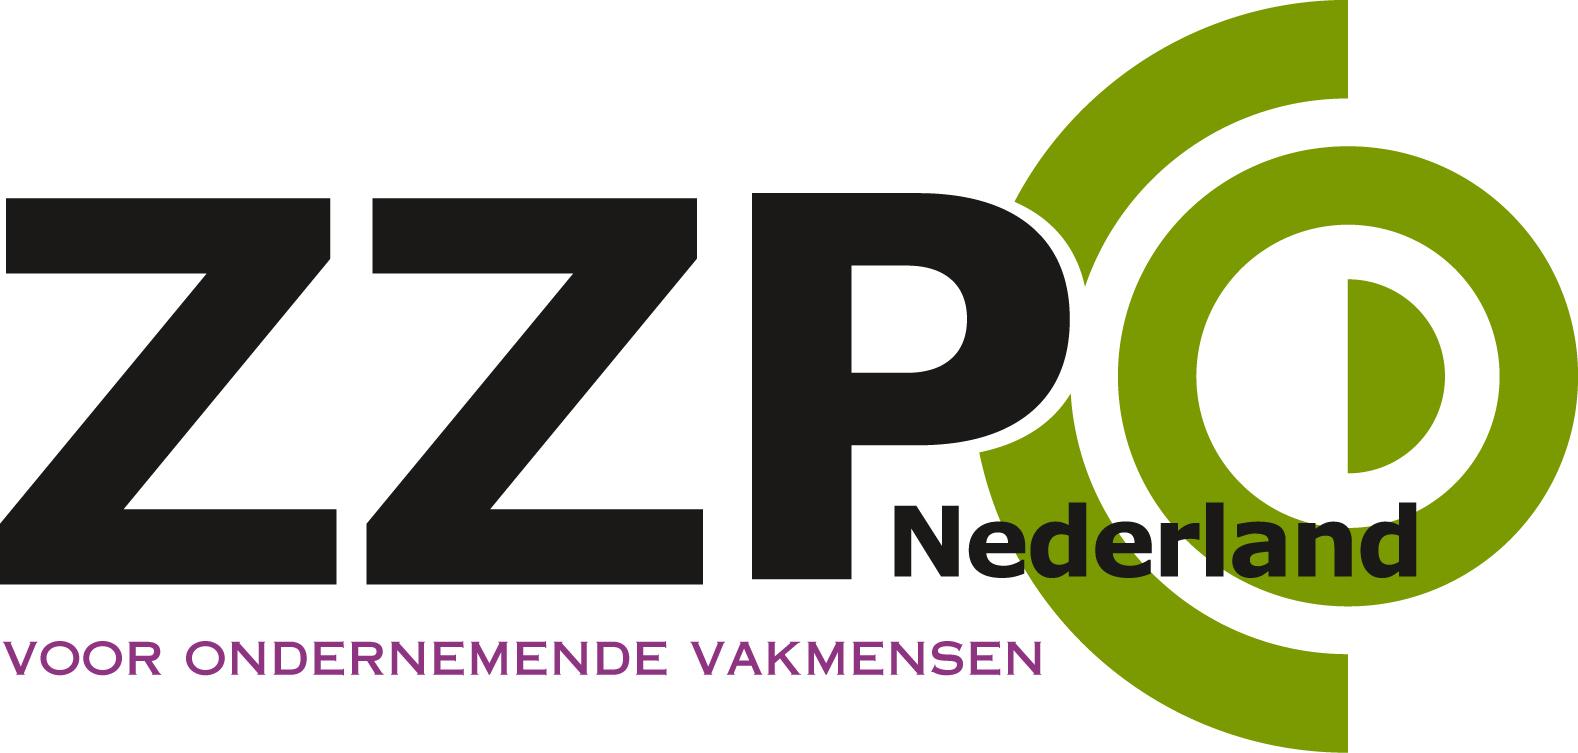 ZZP Nederland - TrackJack